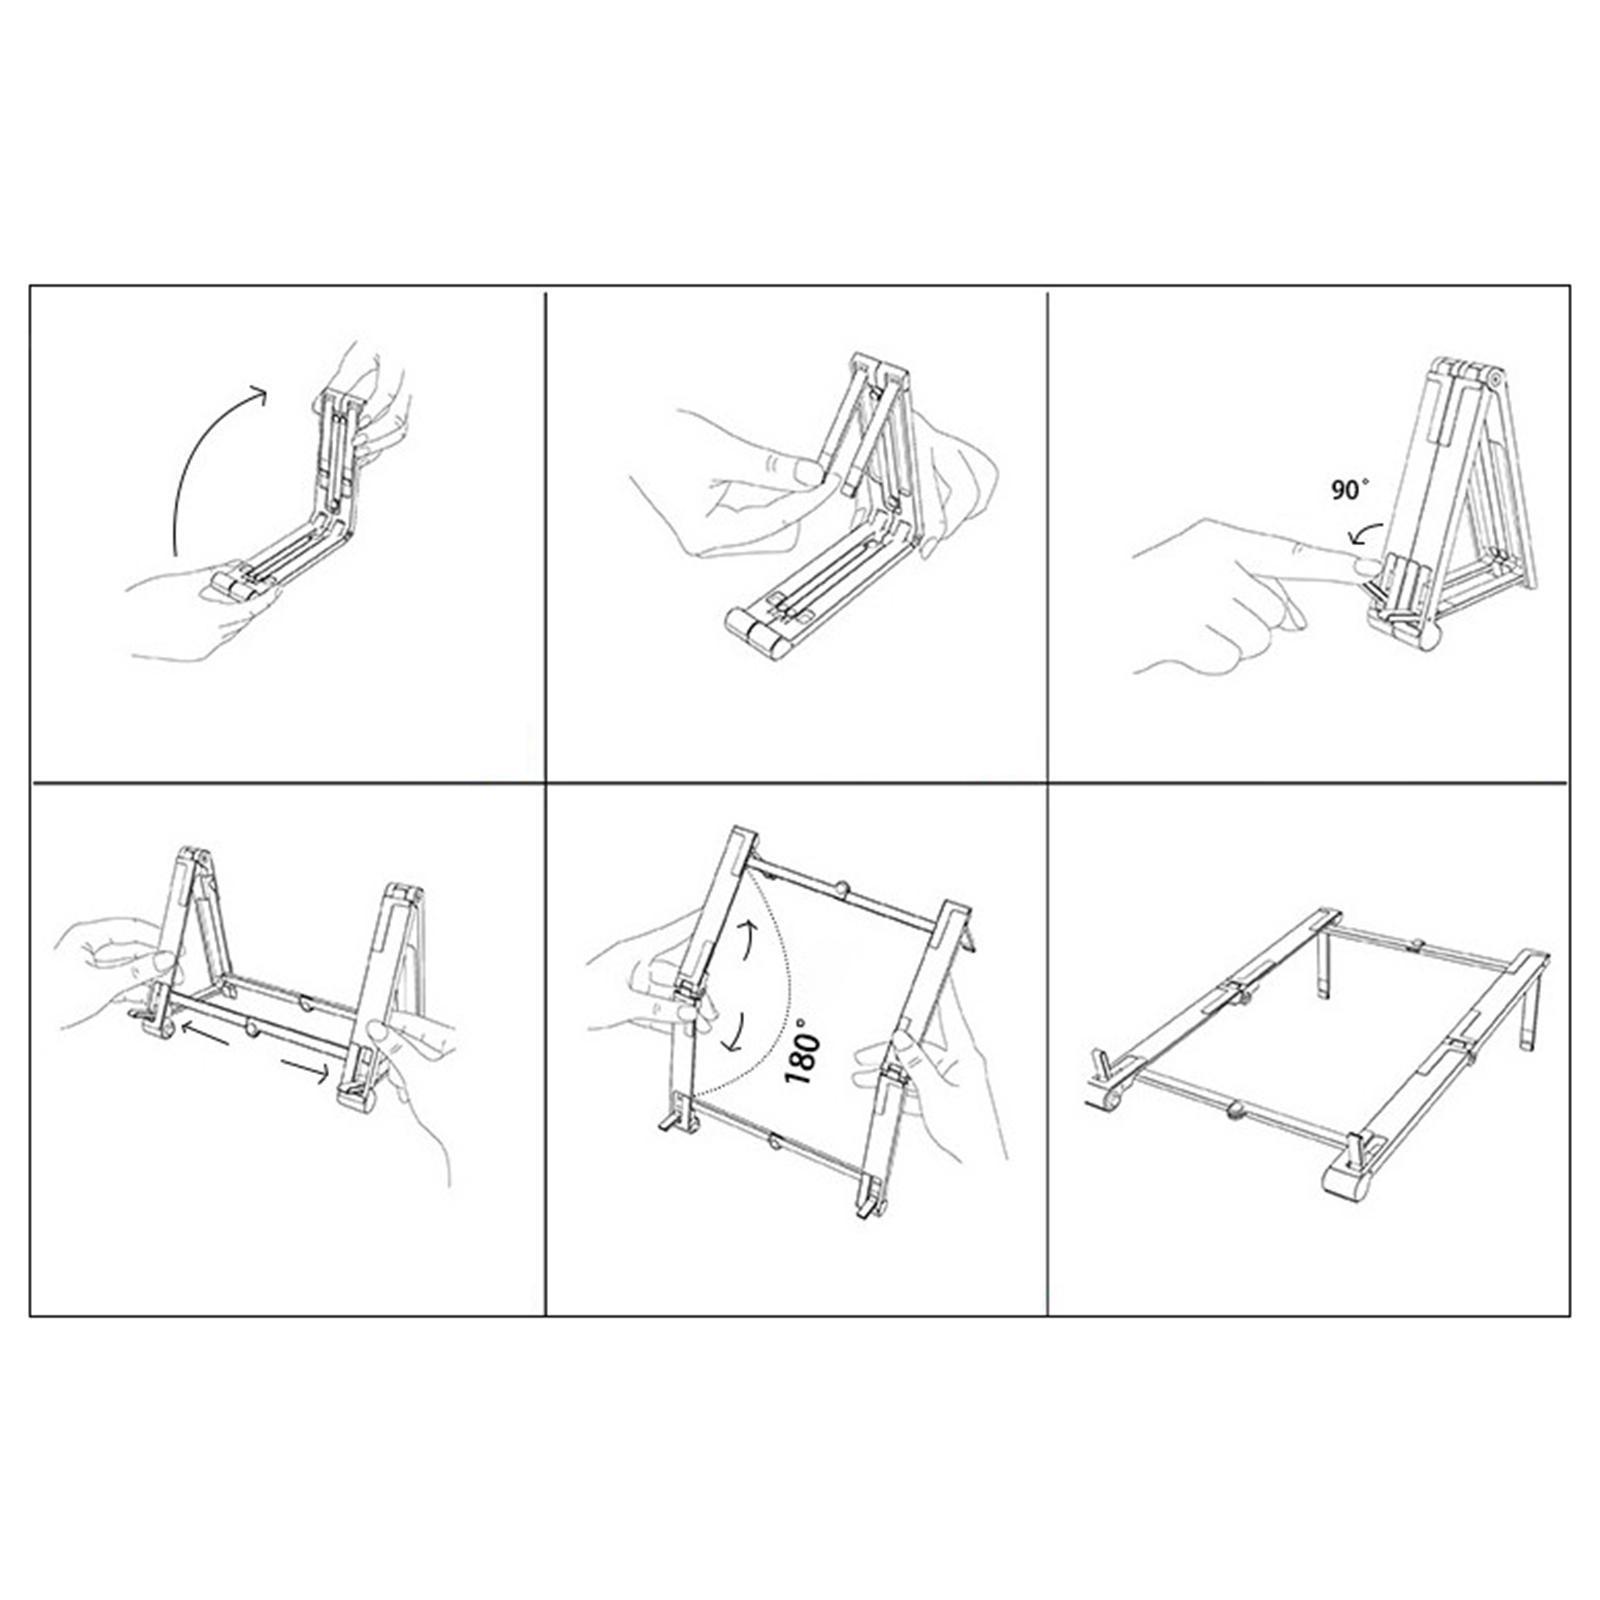 thumbnail 10 - 3 in1 Adjustable Laptop Stand Ergonomic Folding Hollow Radiating for Bracket